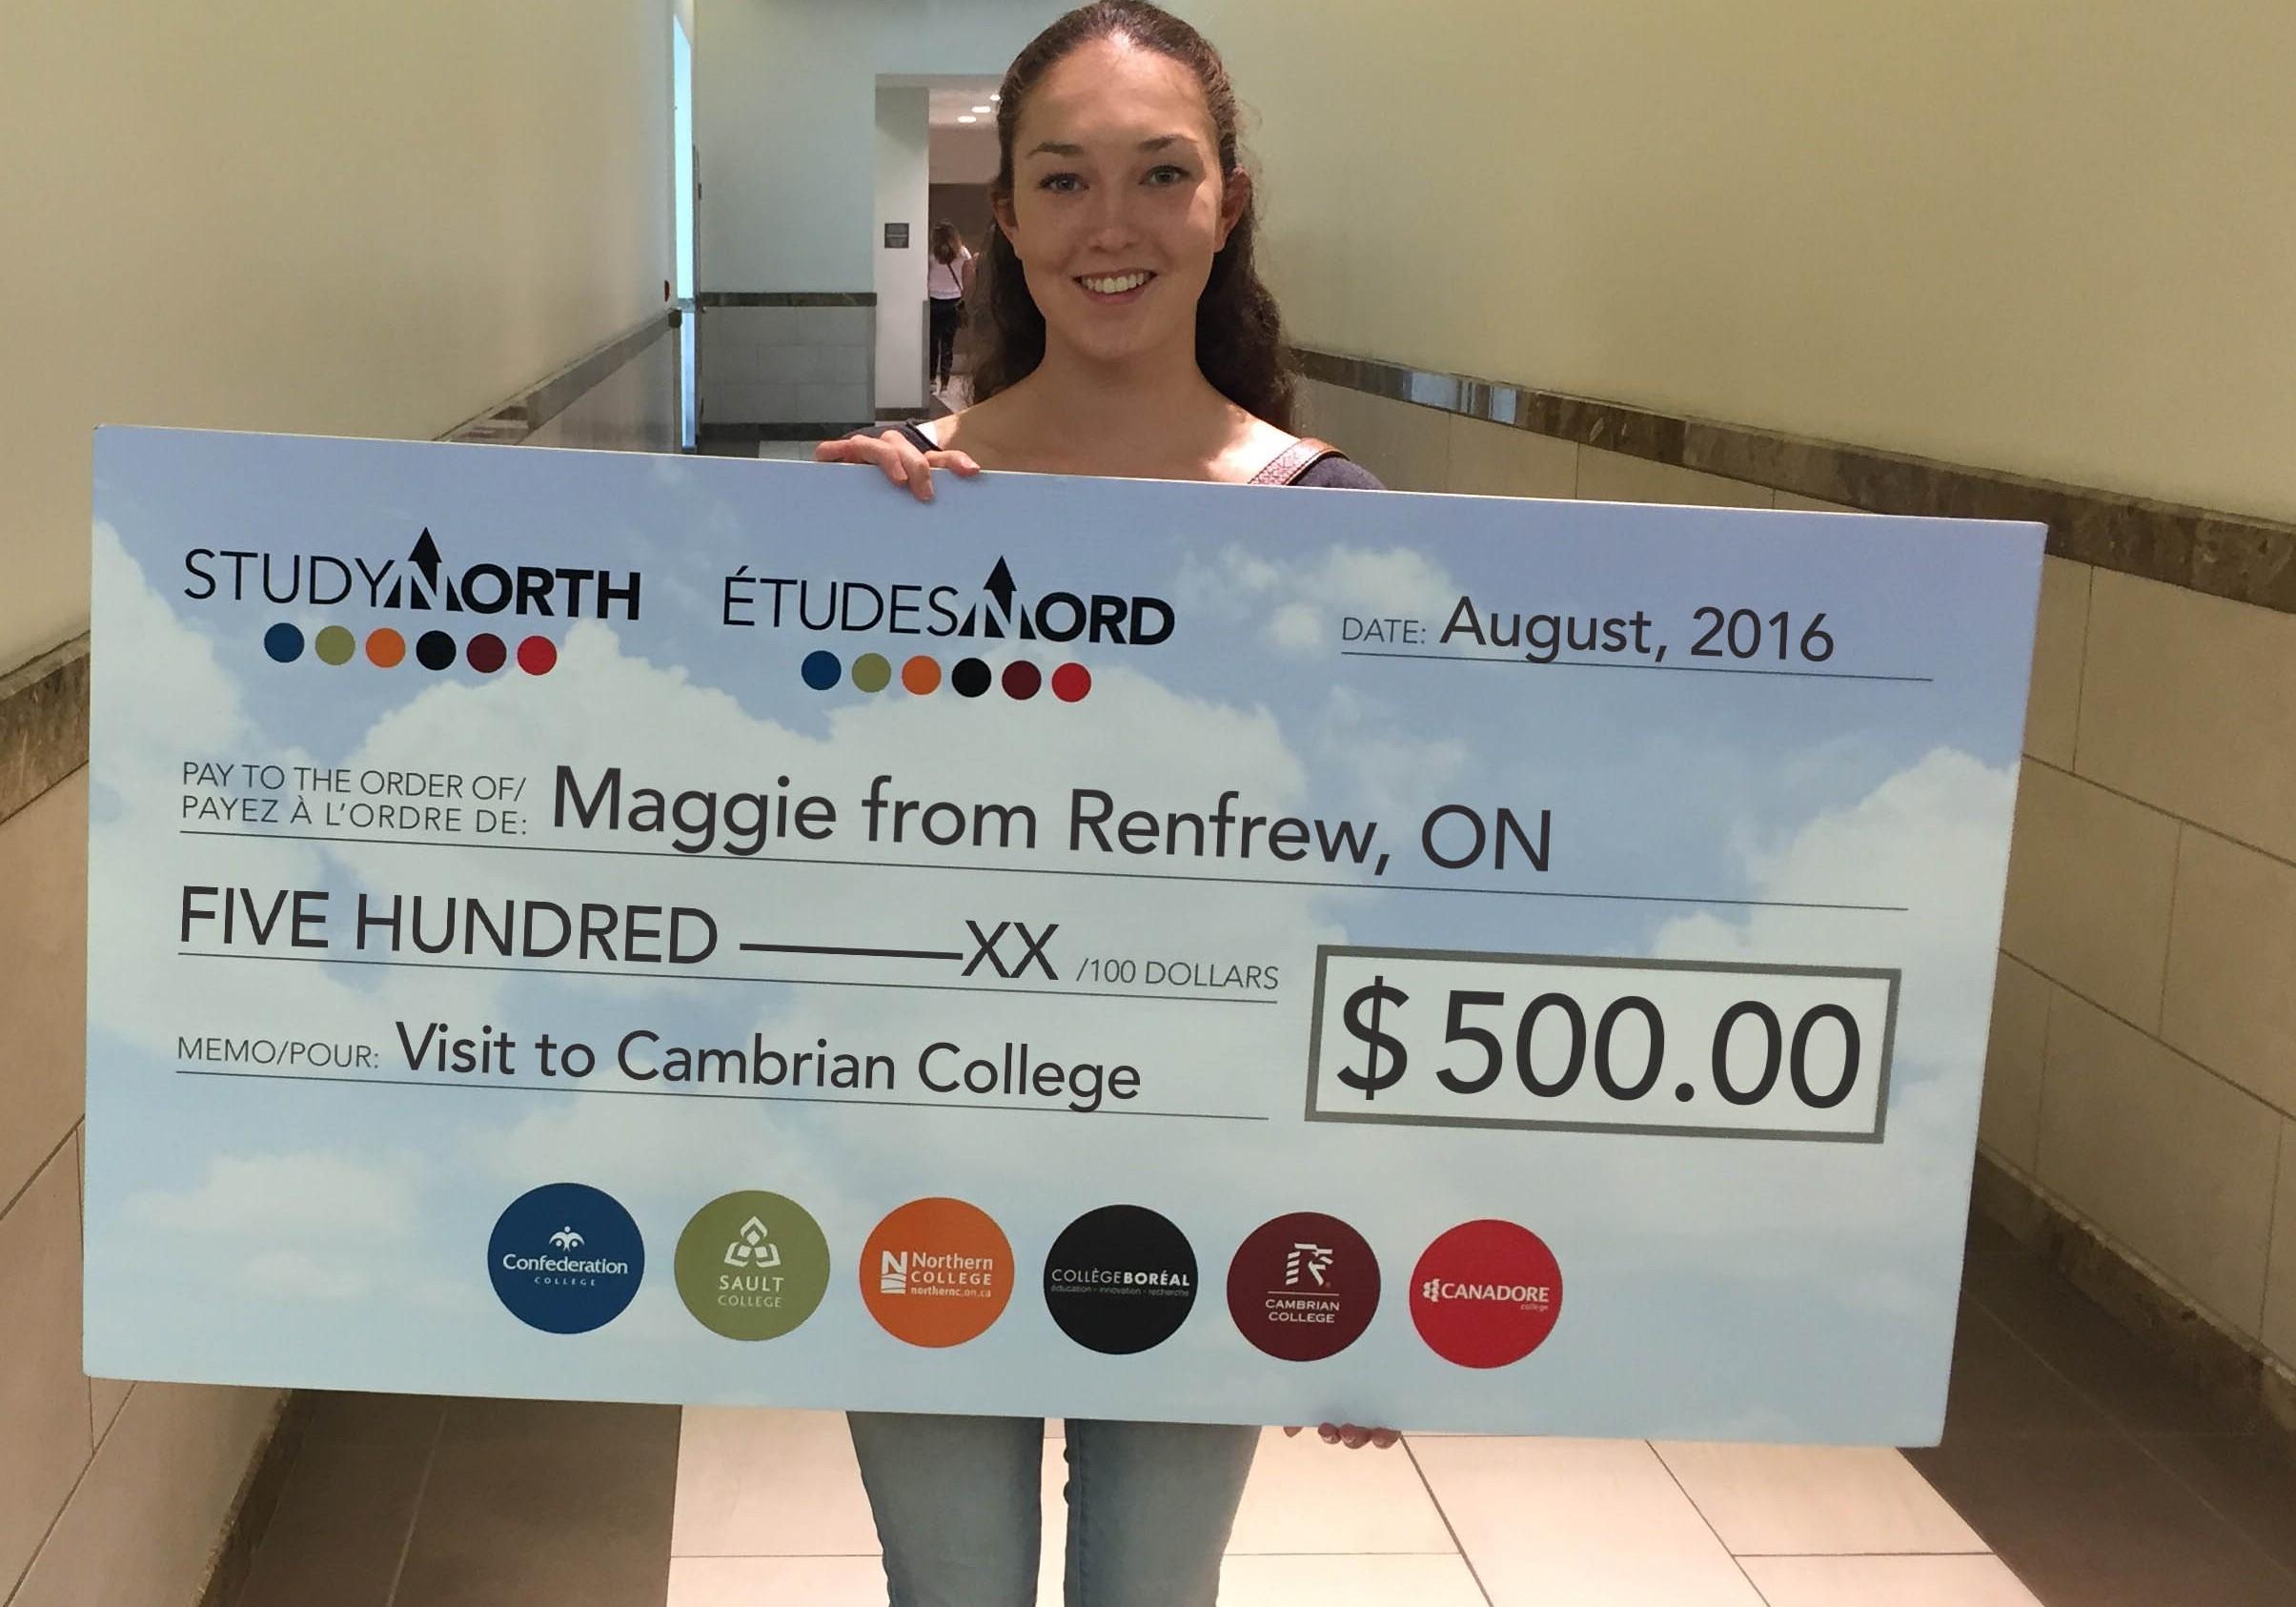 MaggieRenfrewCambrian_cheque